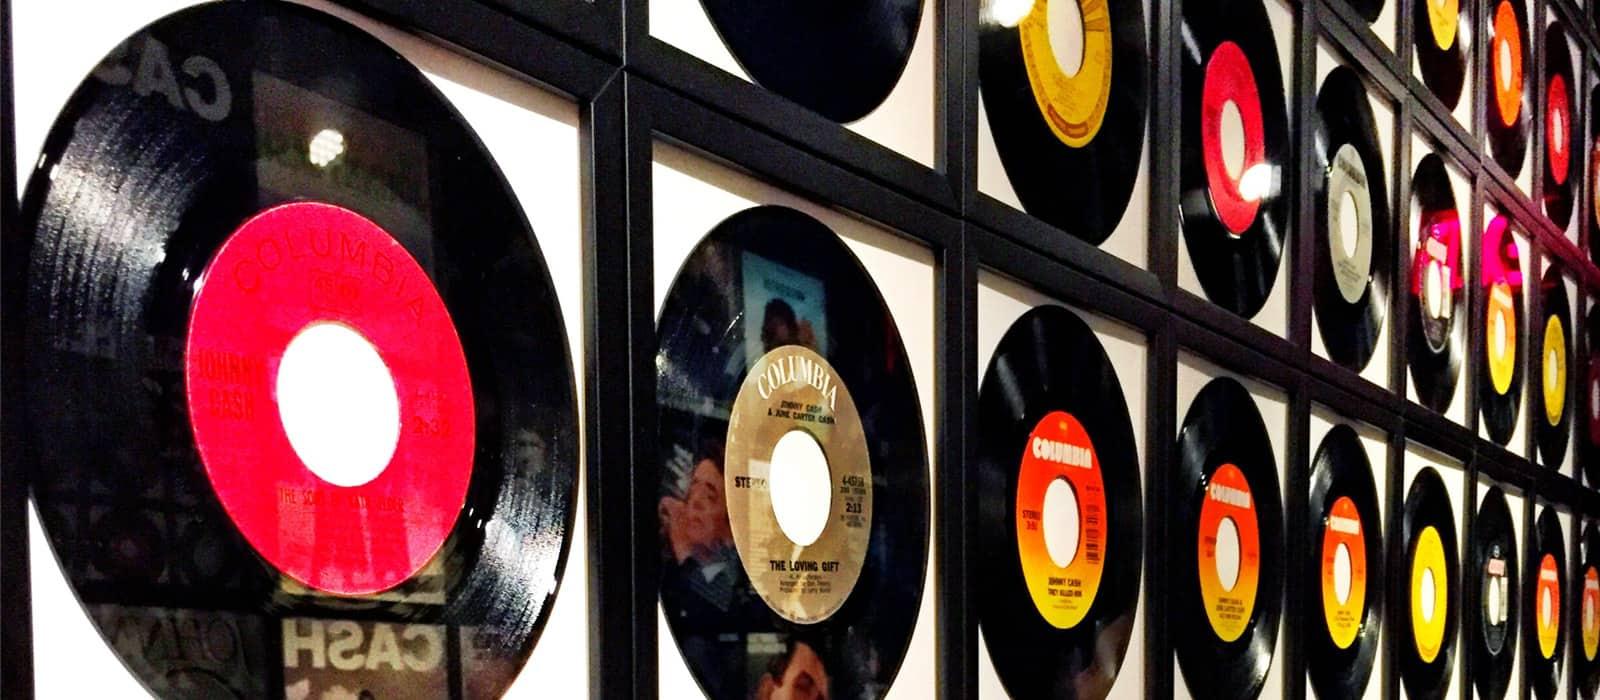 vinyl music trends